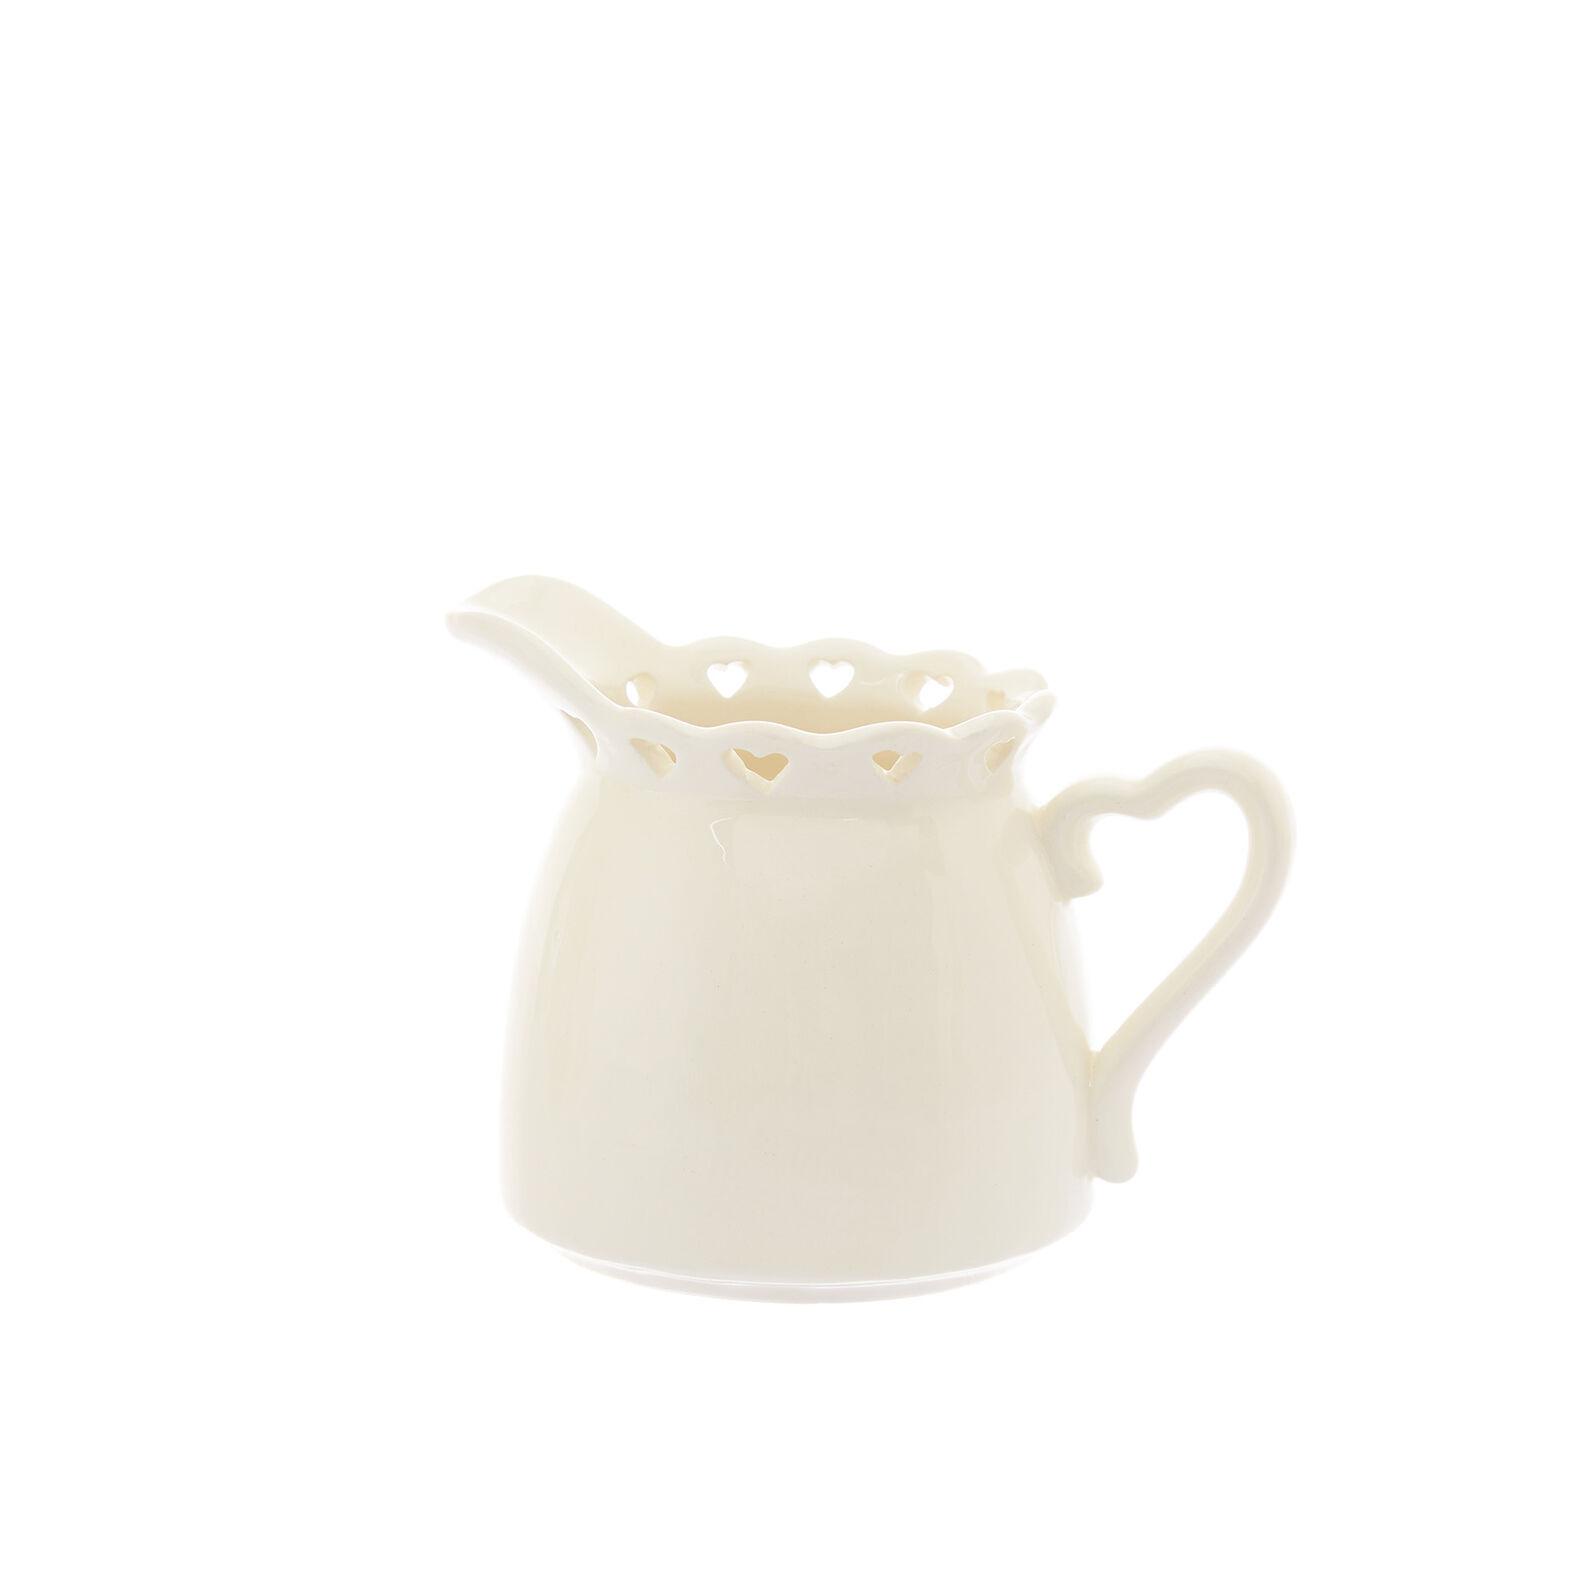 Ceramic milk jug with openwork heart design